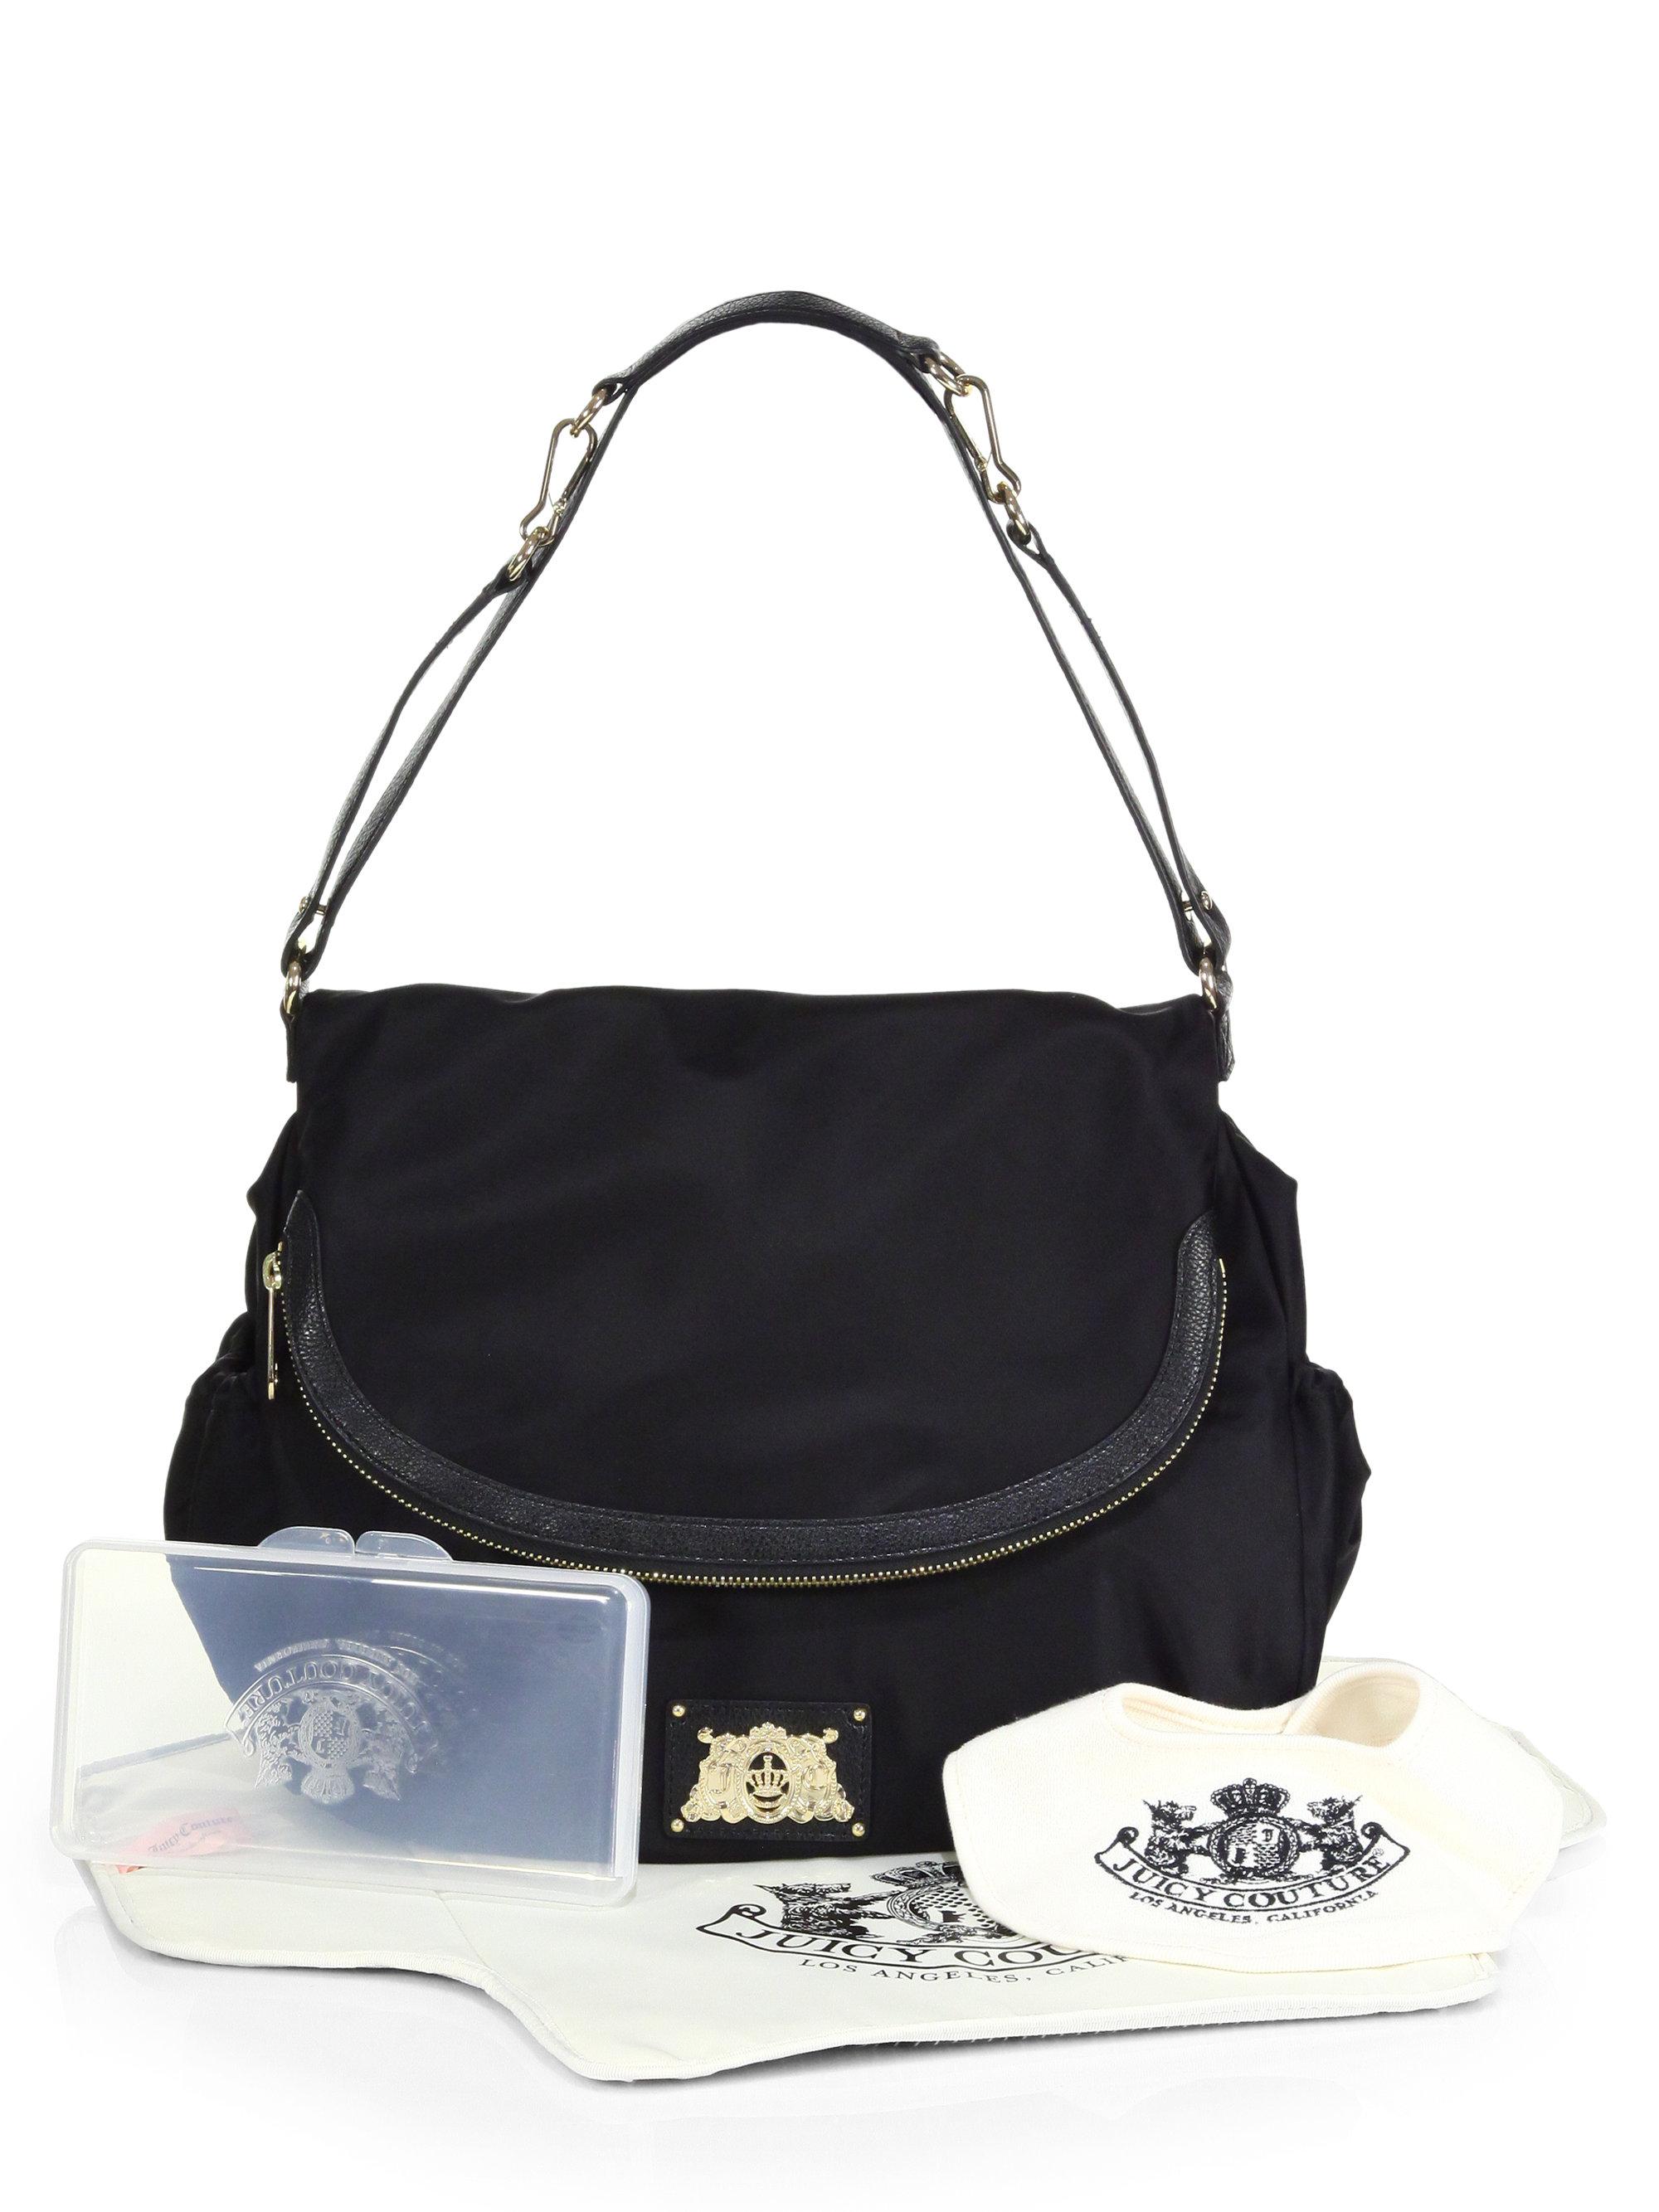 Lyst Juicy Couture Malibu Baby Bag in Black